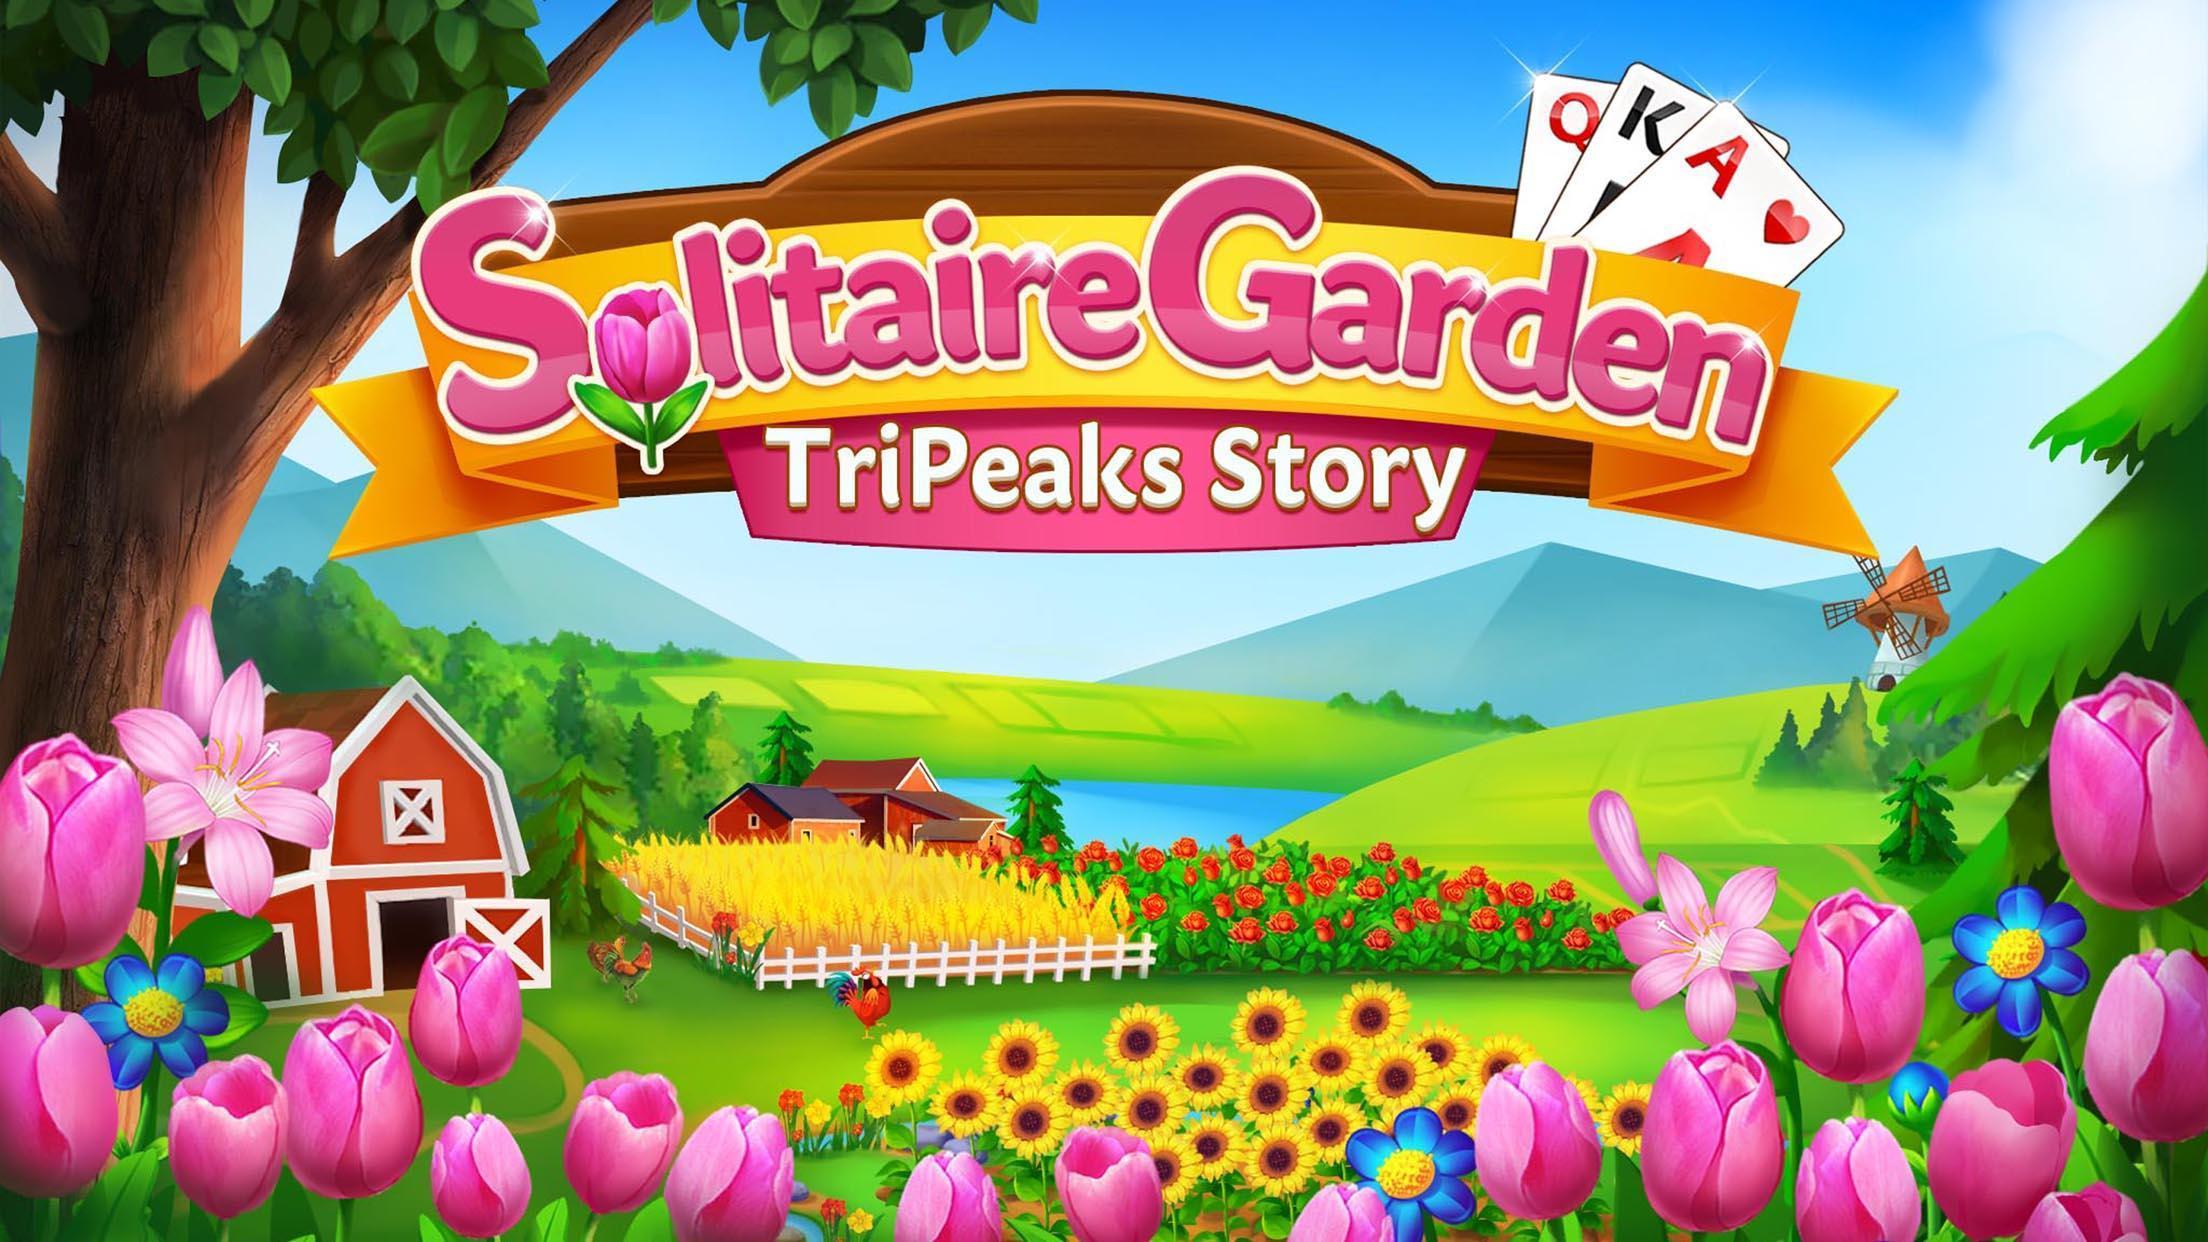 Solitaire Garden - TriPeaks Story 1.5.1 Screenshot 5